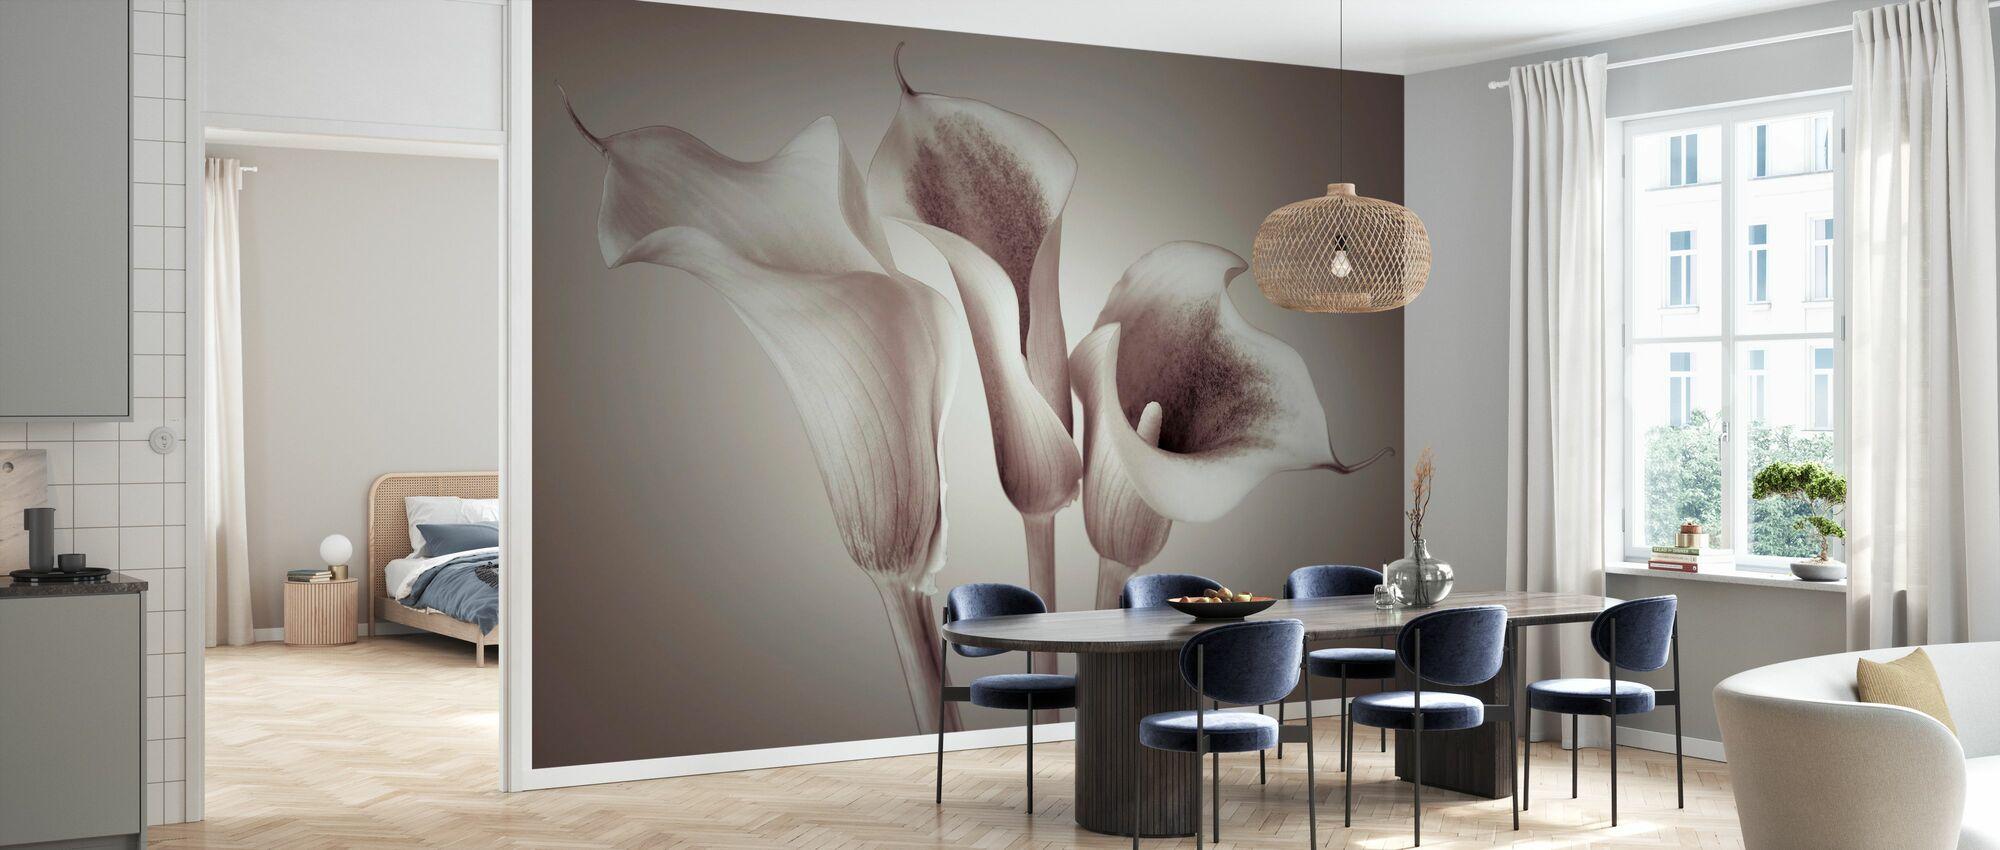 Shut up, Lily. - Wallpaper - Kitchen